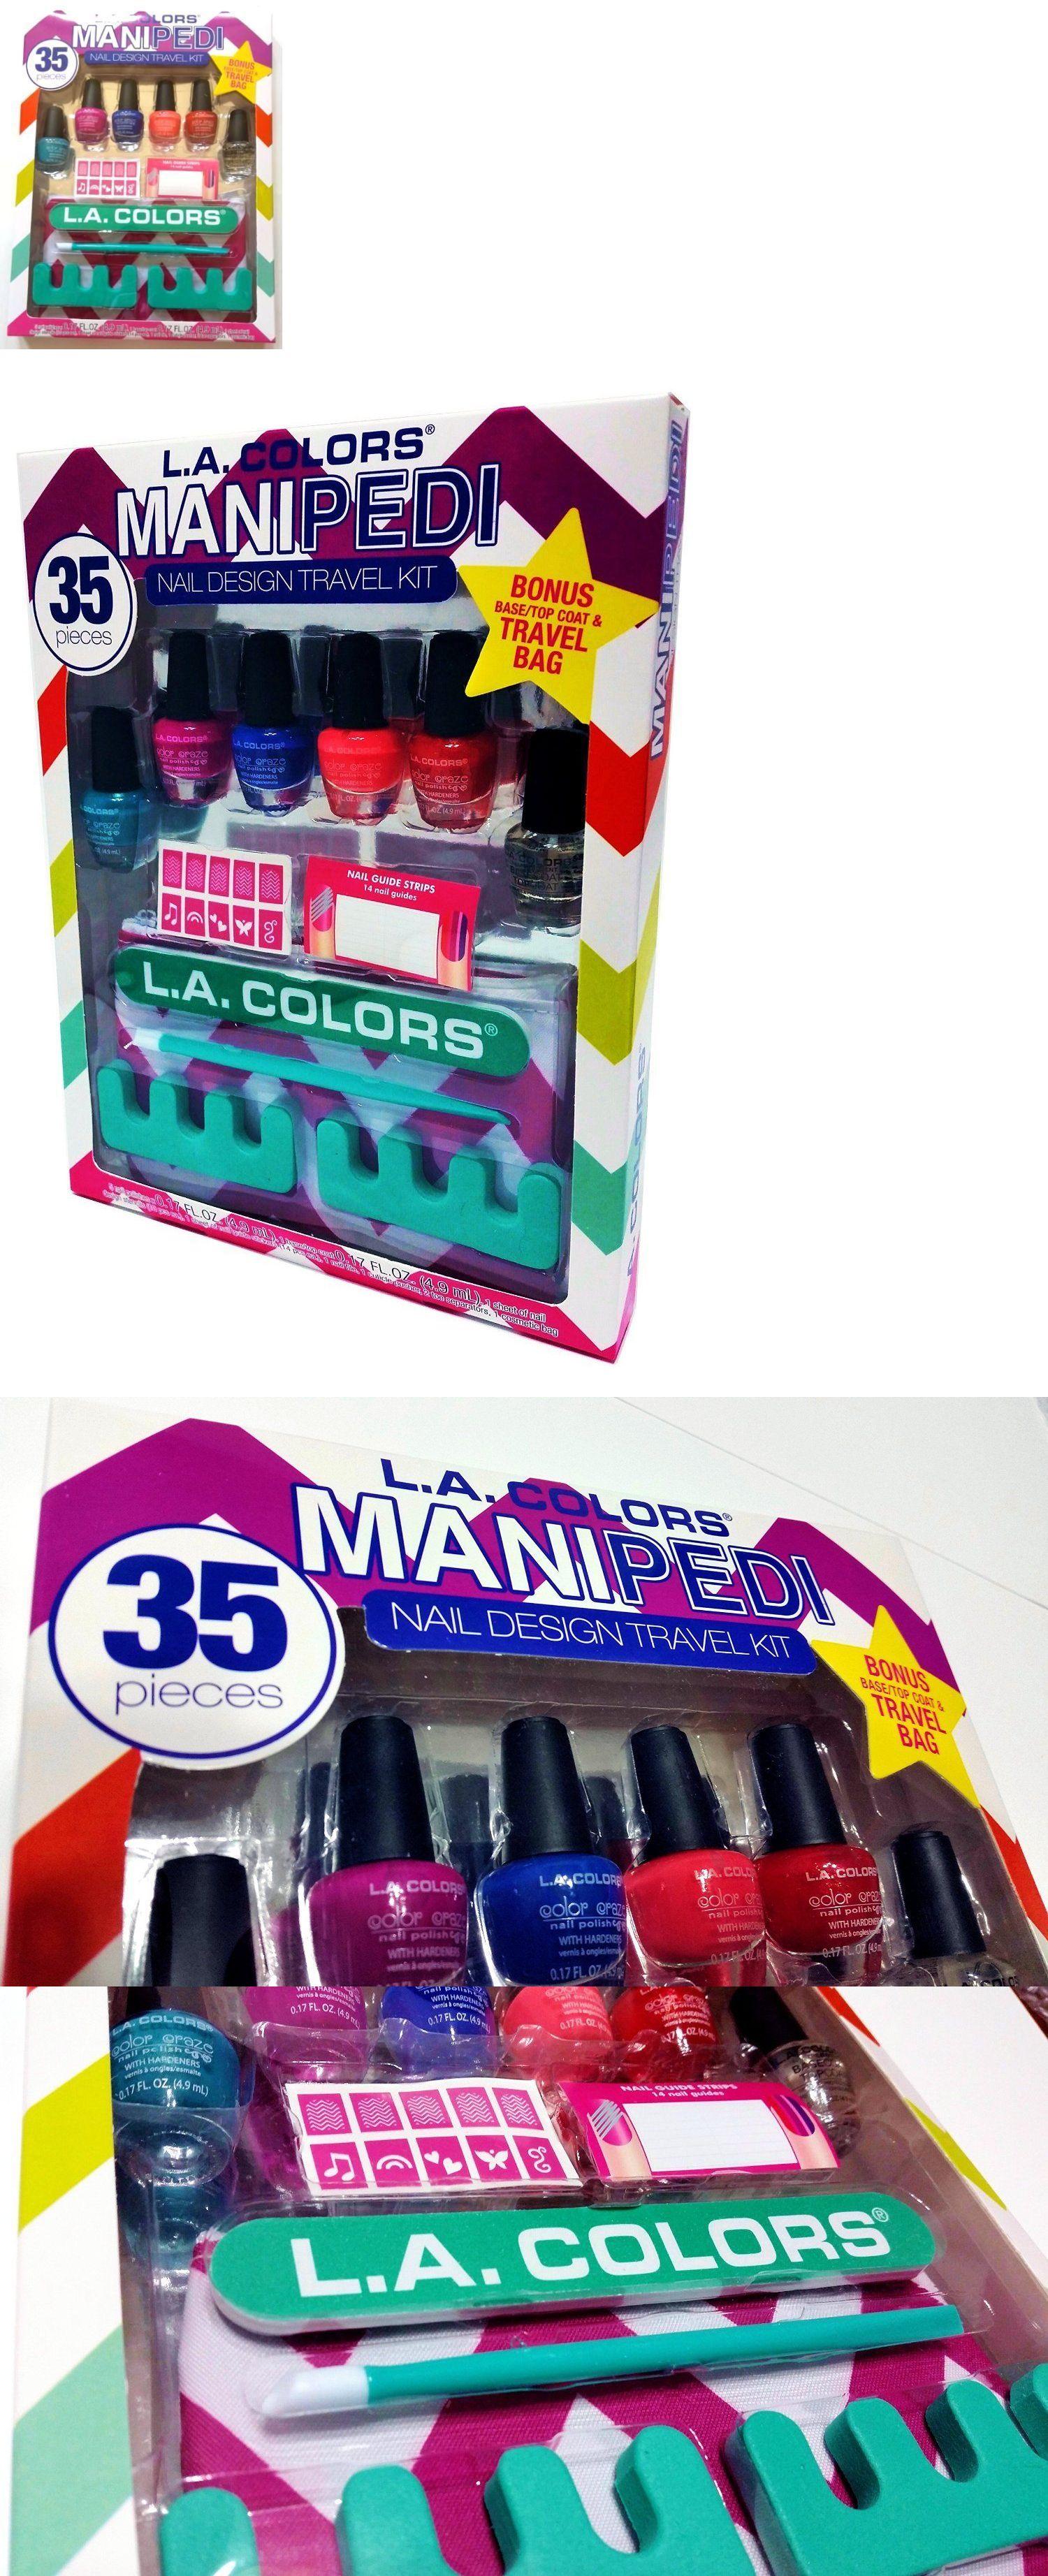 Manicure Pedicure Tools And Kits La Colors 35 Piece Mani Pedi